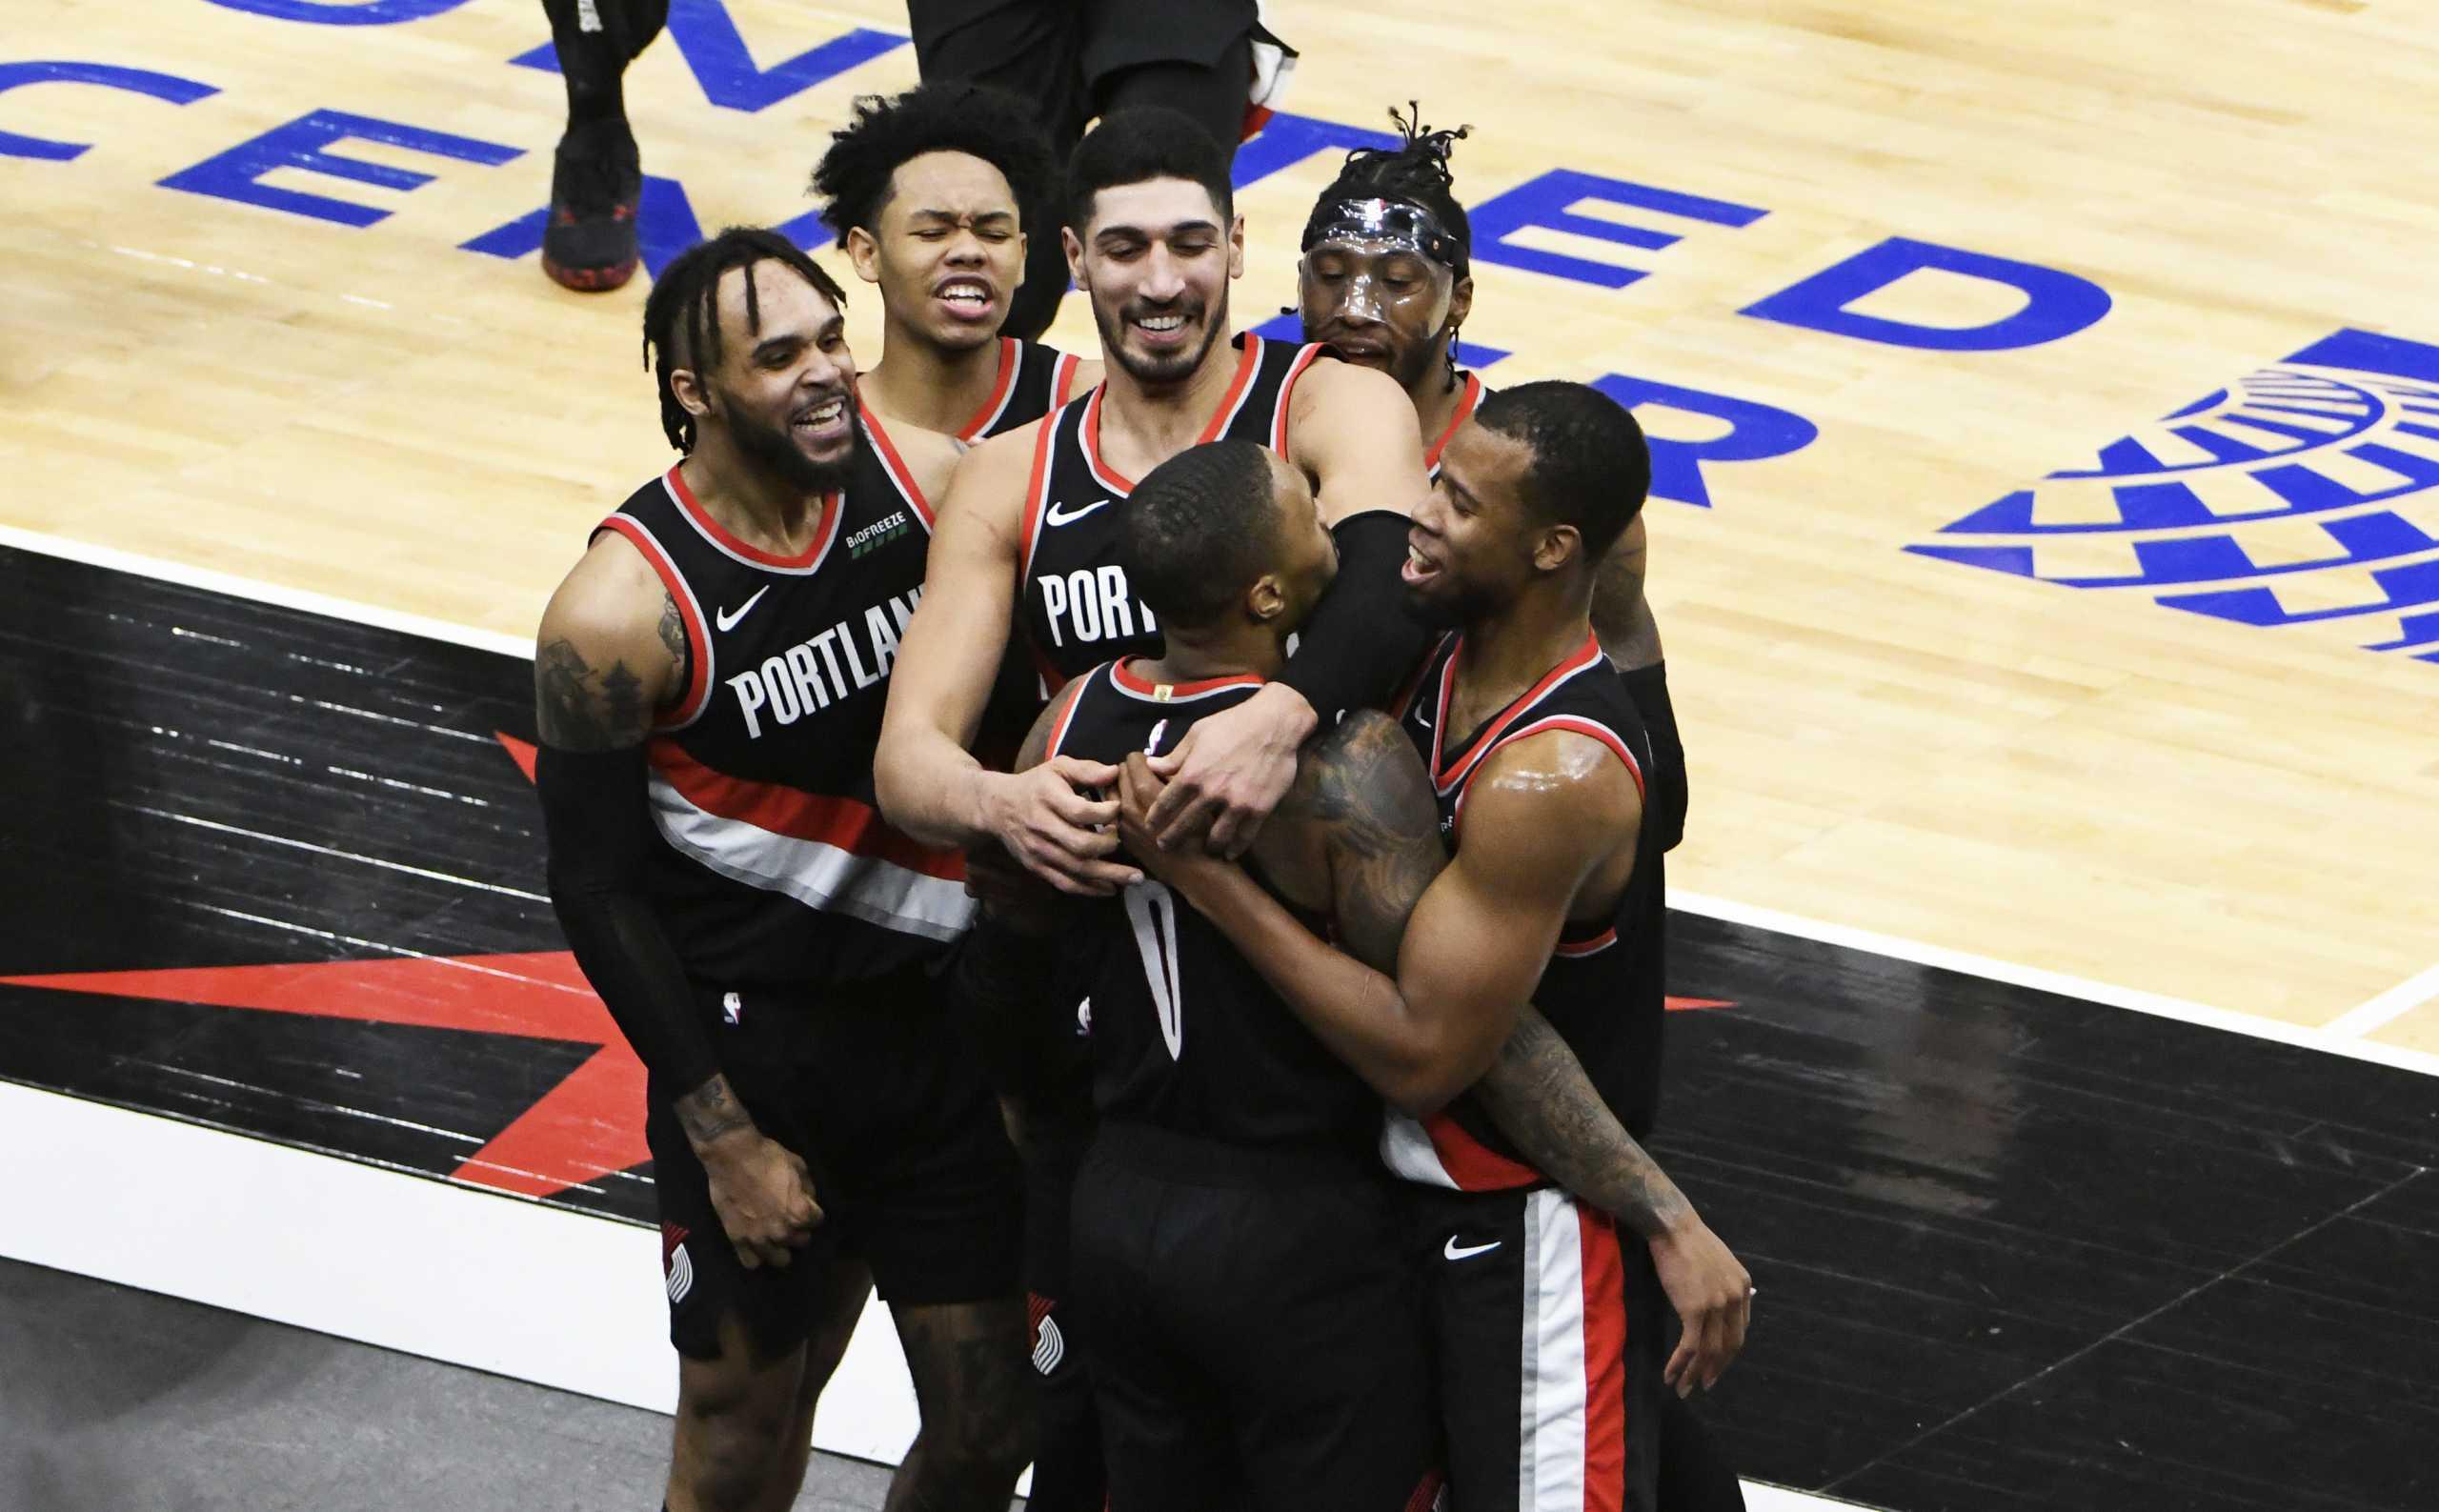 NBA: Οι Λέικερς «άλωσαν» τη Βοστώνη – Απίστευτο «buzzer beater» και νίκη οι Μπλέιζερς (video)